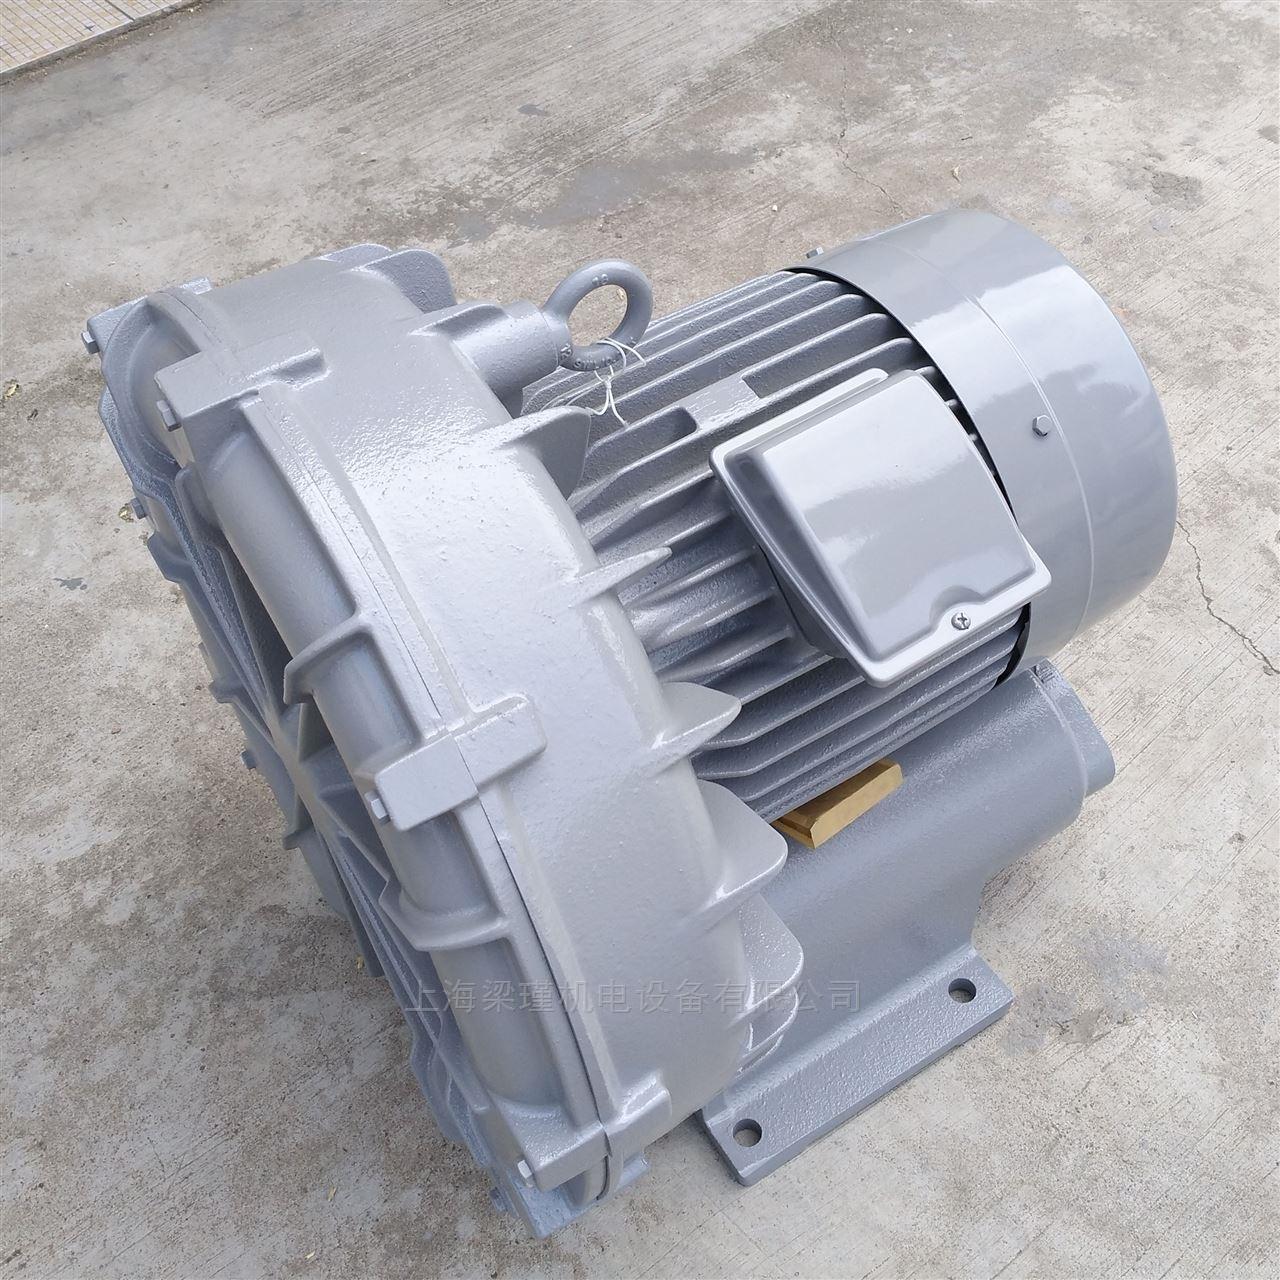 VFC608A-S富士鼓风机